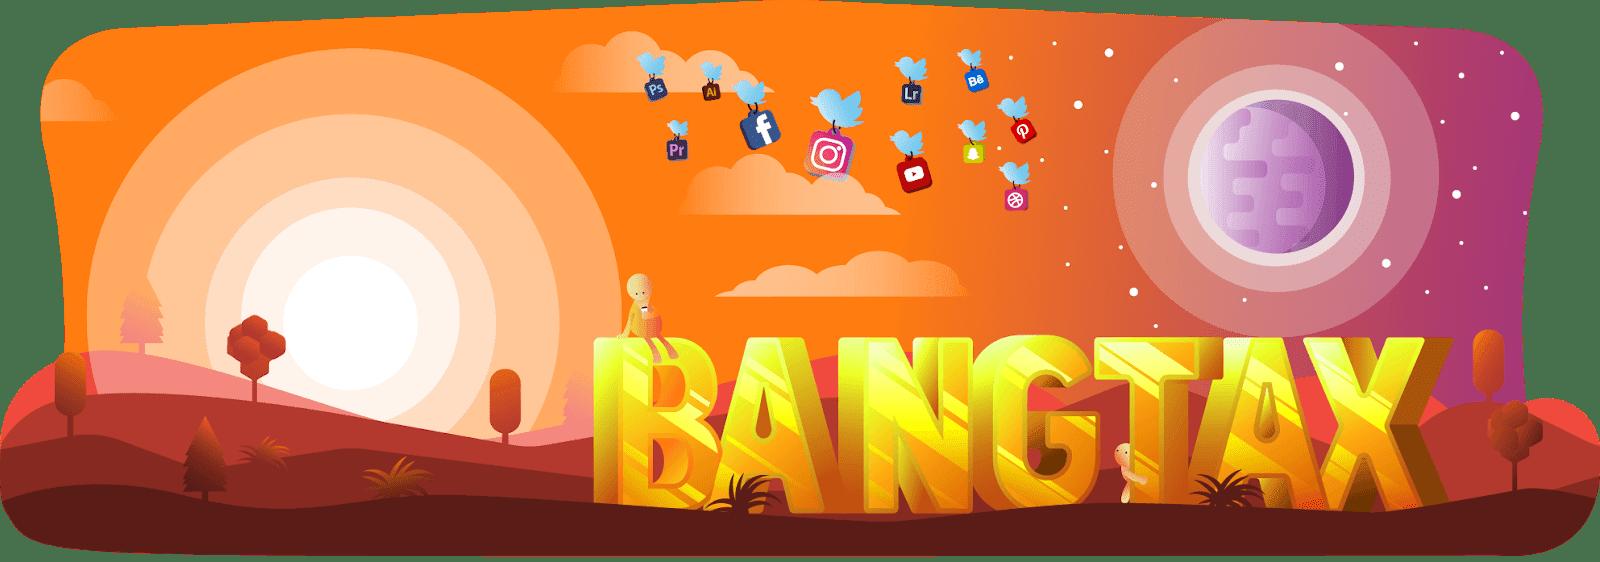 Bangtax